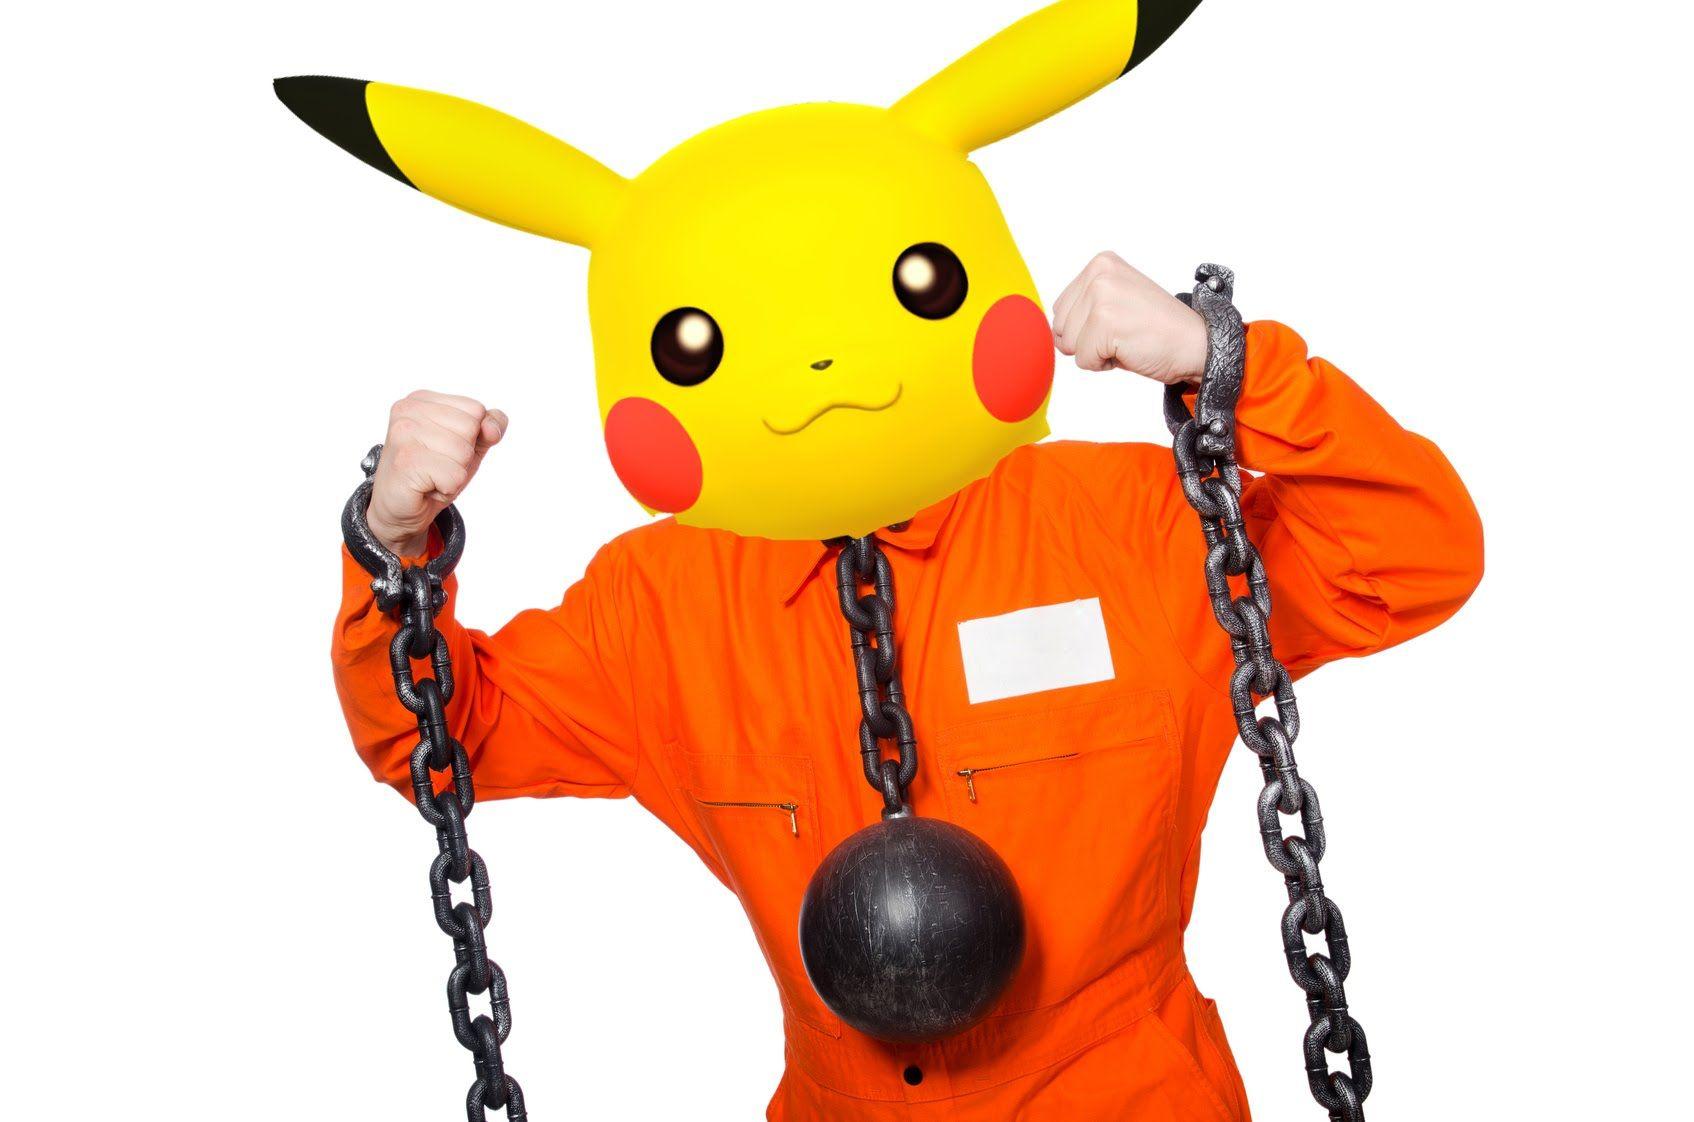 How to catch a pokemon pokemon catch pokemon pokemon gif